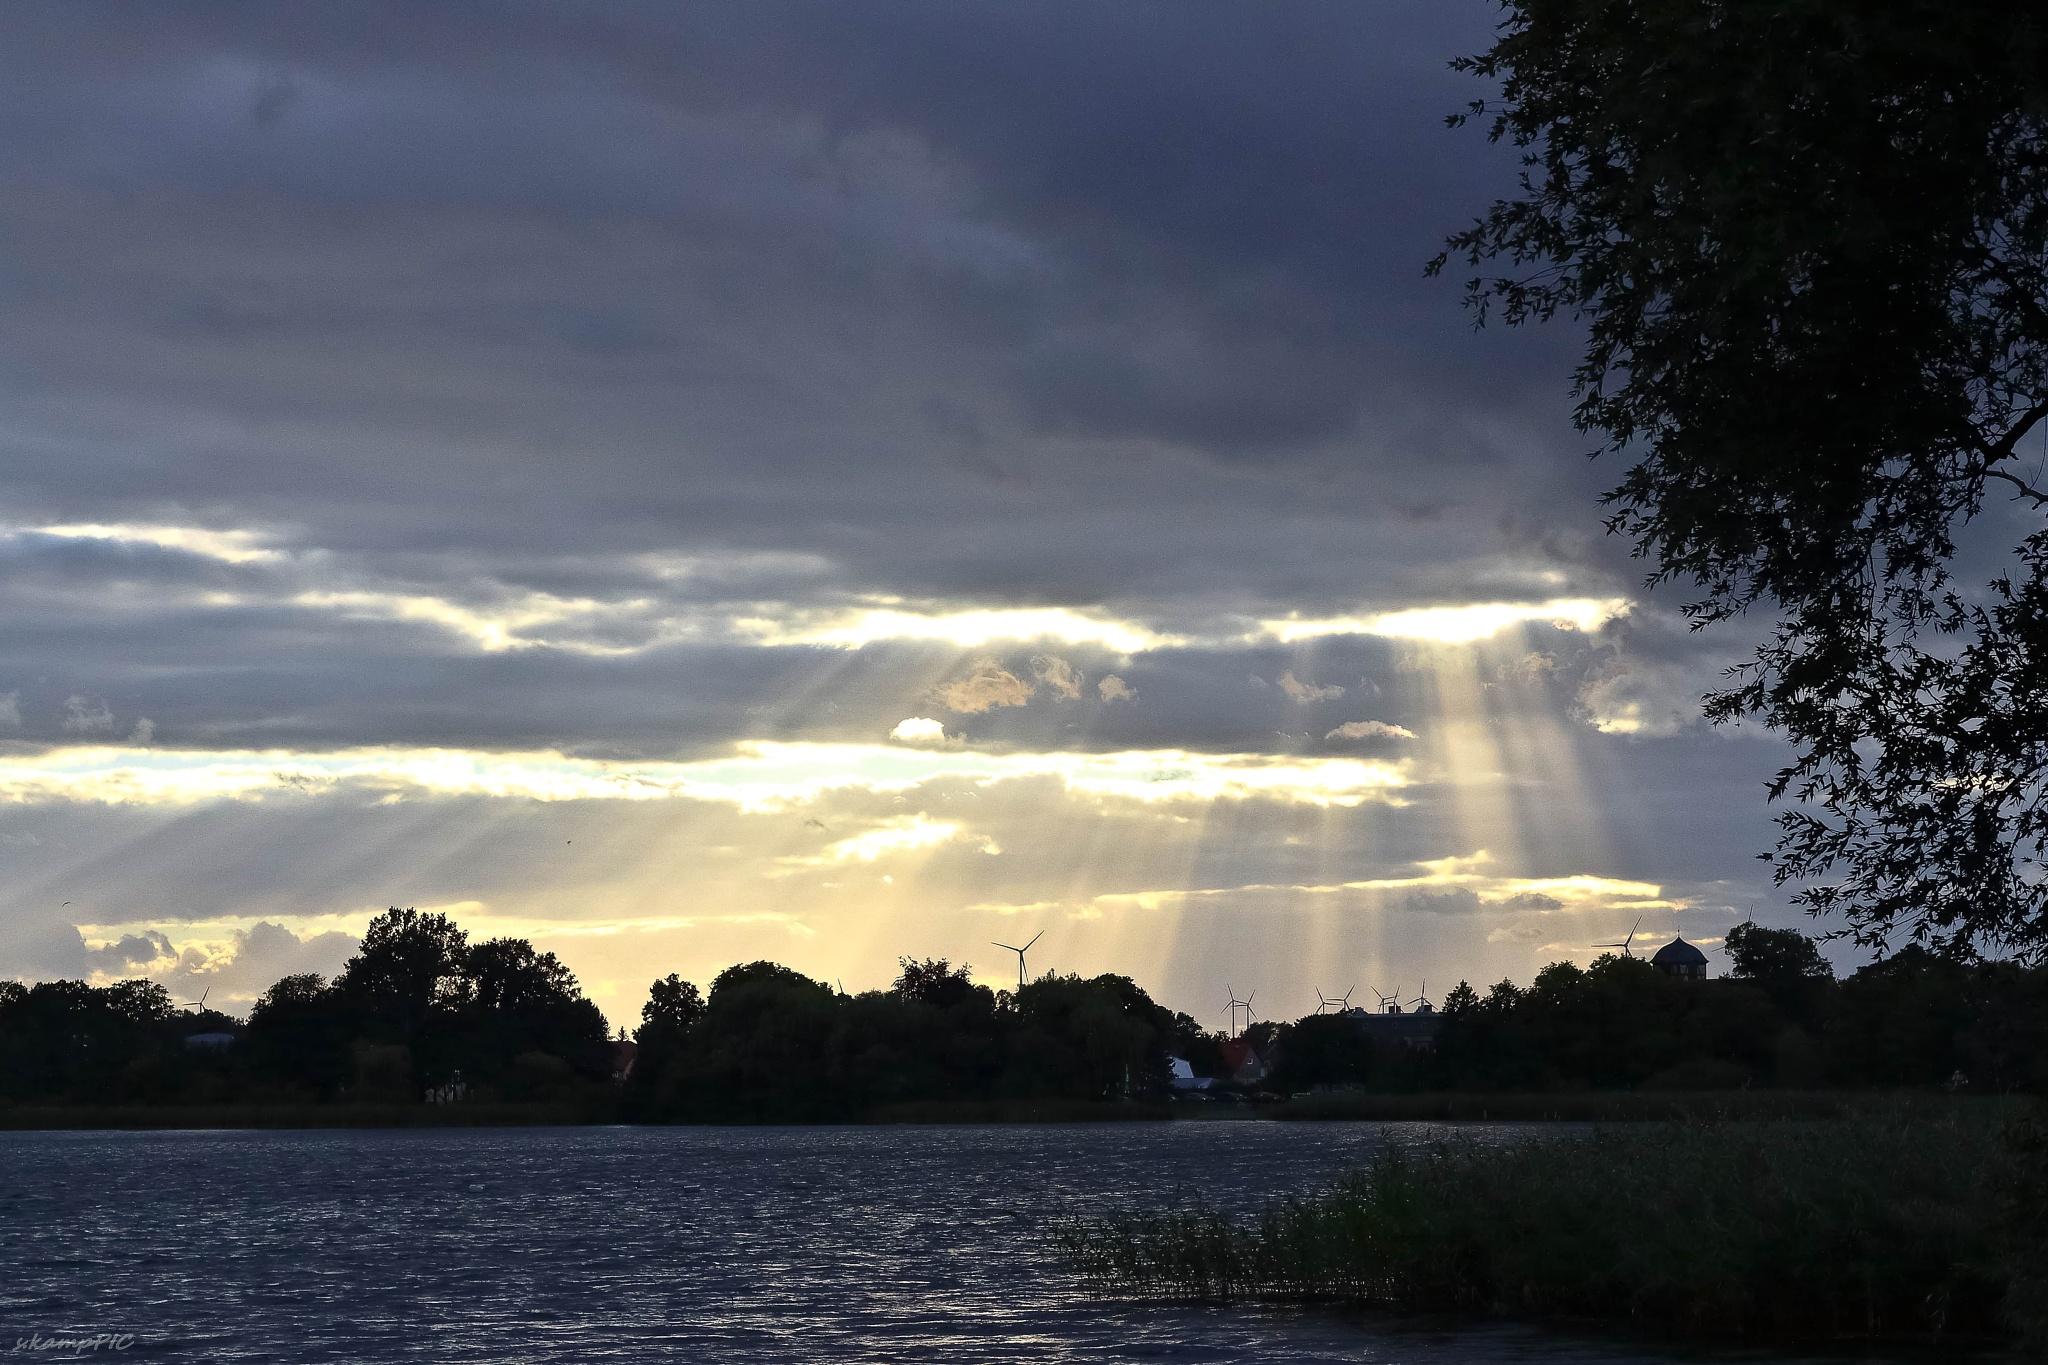 evening sun by Sebastian Kamp